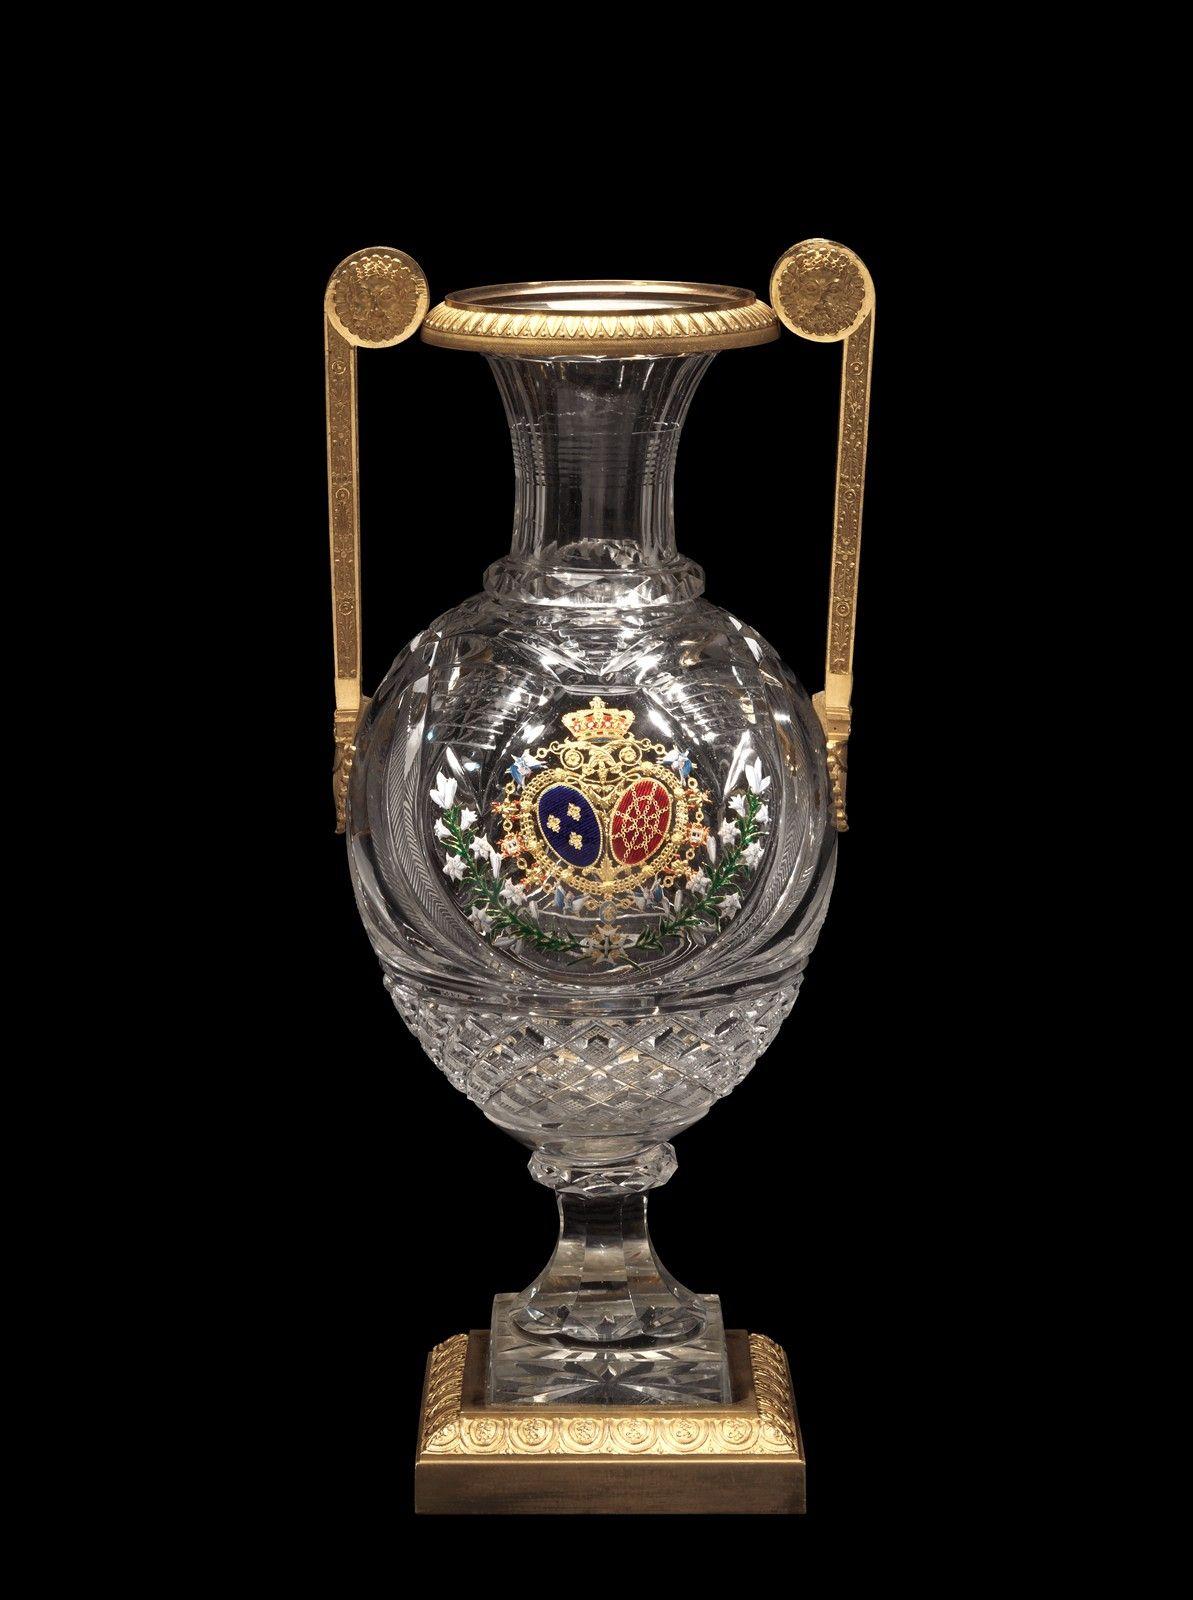 Cristalleries de baccarat france extra trio poker